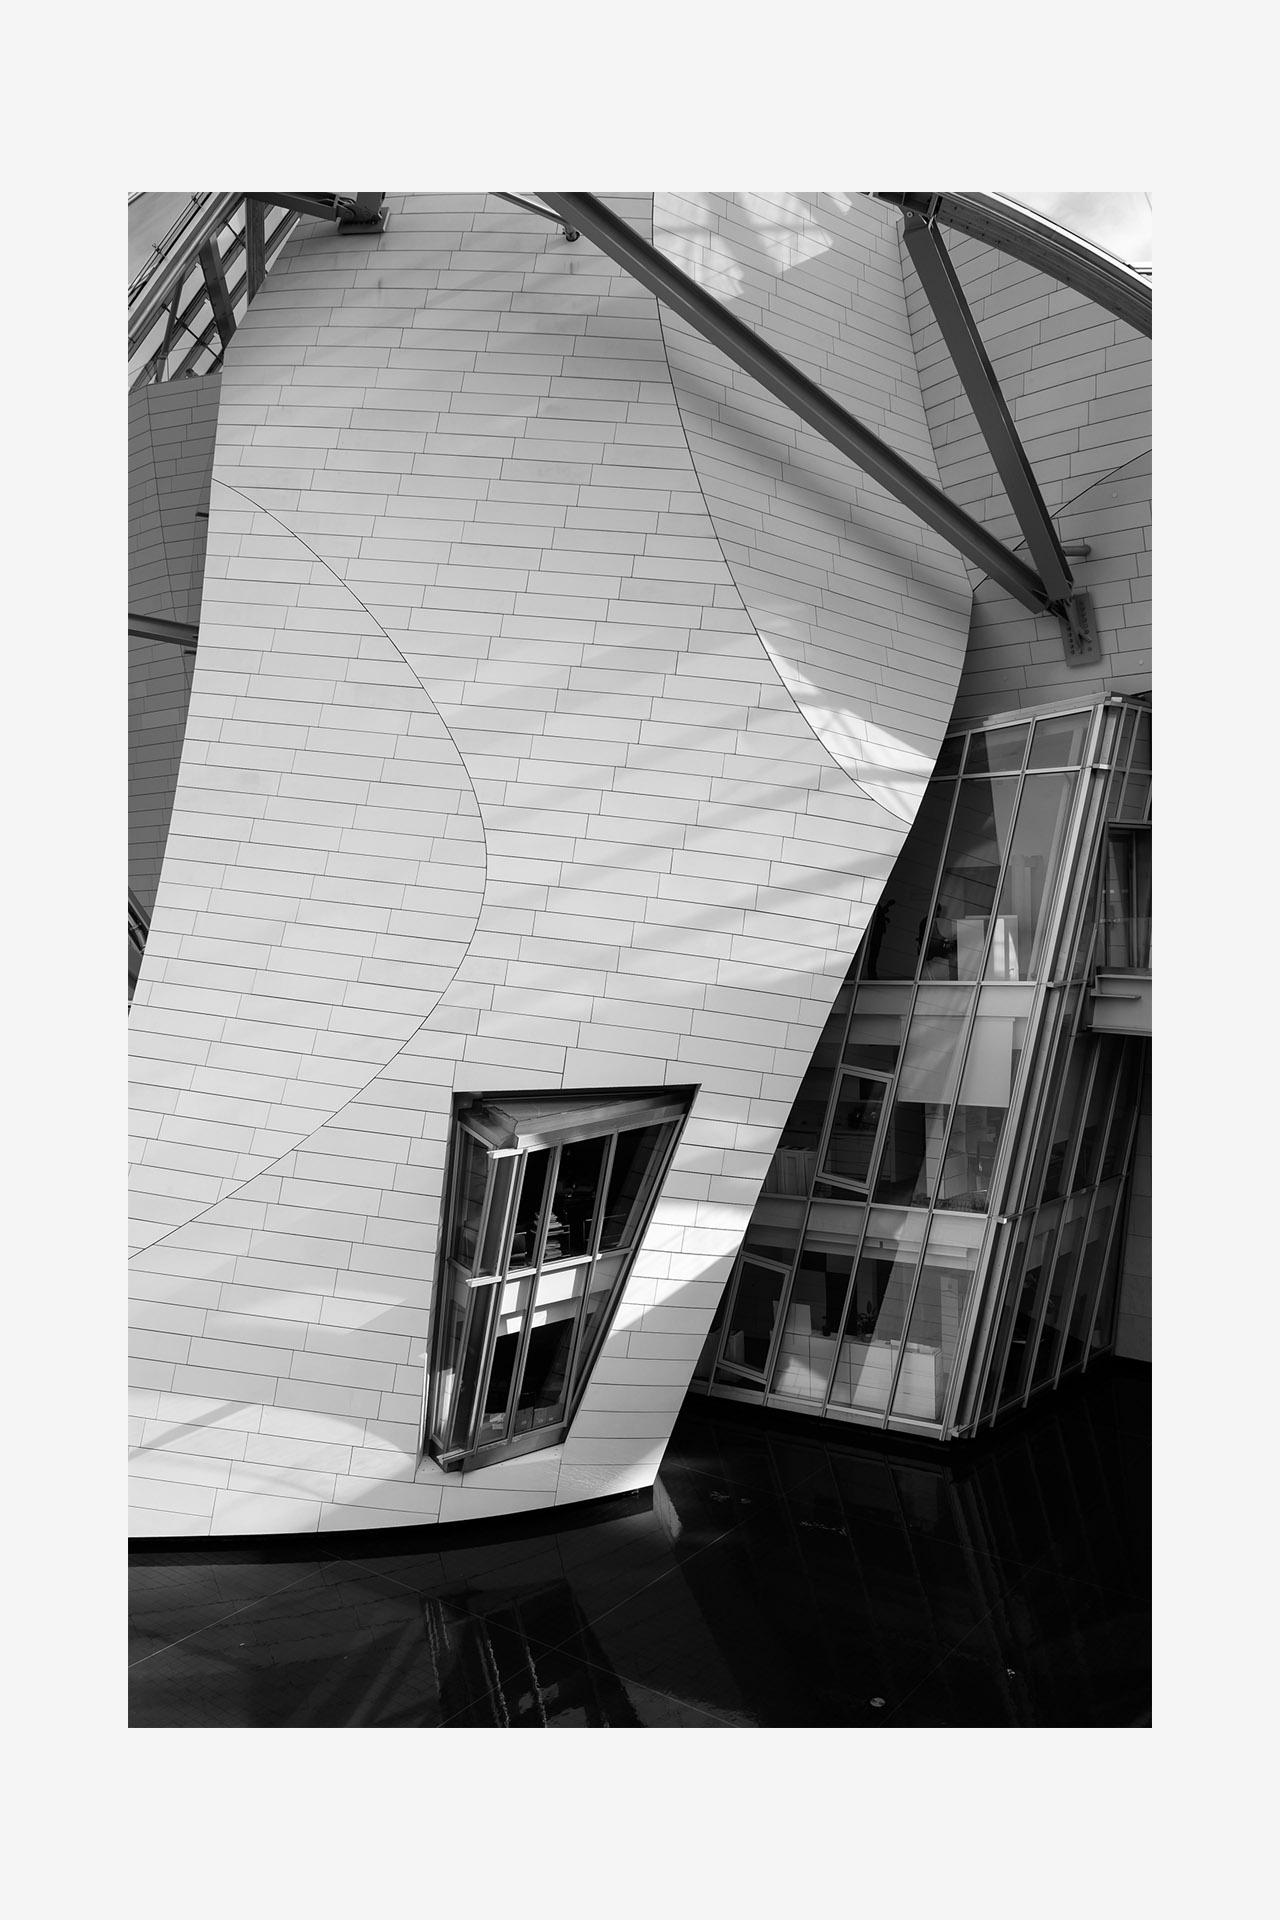 fondation-louis-vuitton-07B